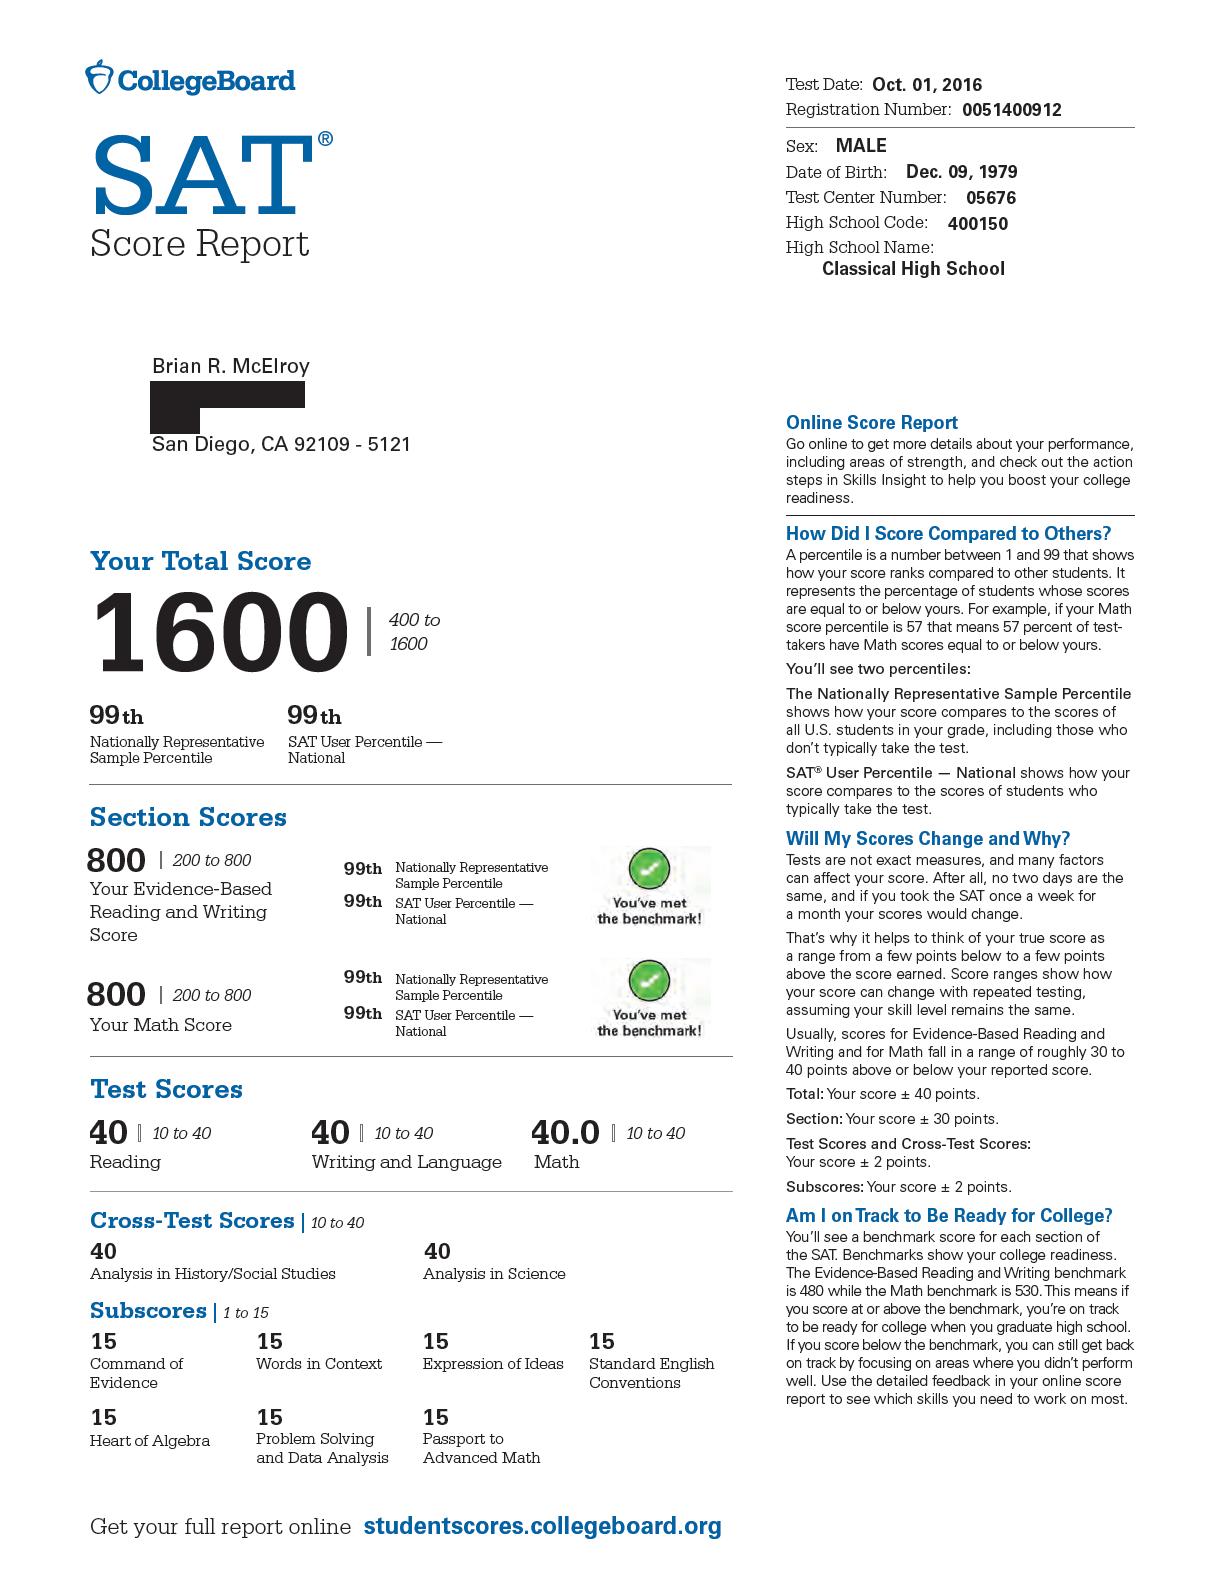 014 Average Sat Essay Score Example Brian20mcelroy20october20201620sat20score20report Redacted Amazing 2016 Full